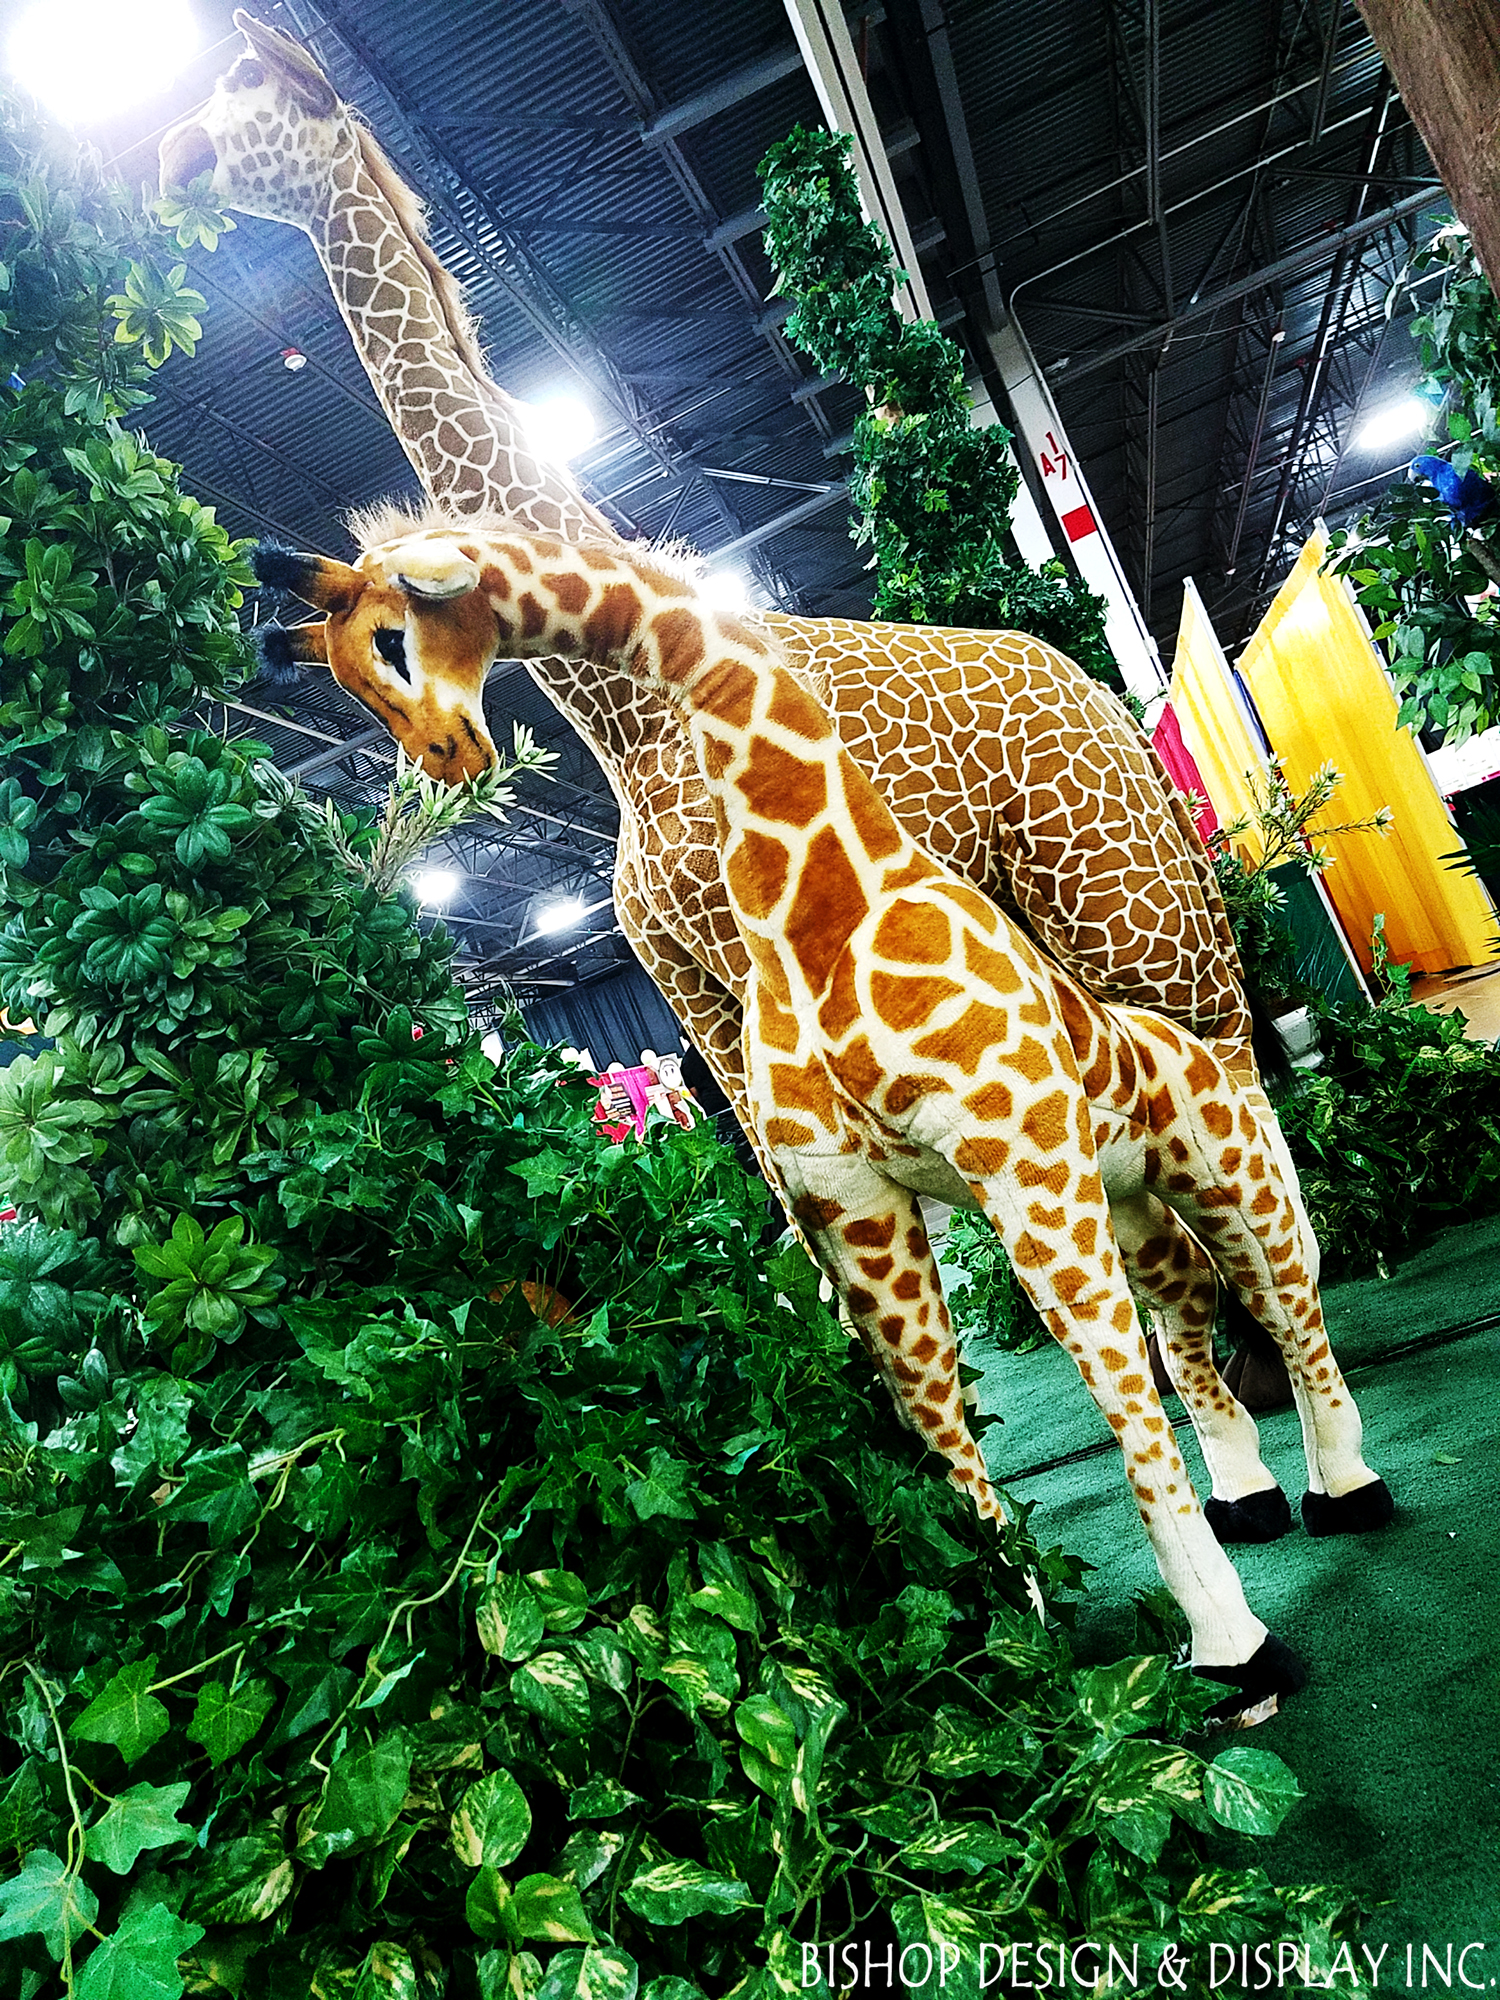 Plush Giraffes